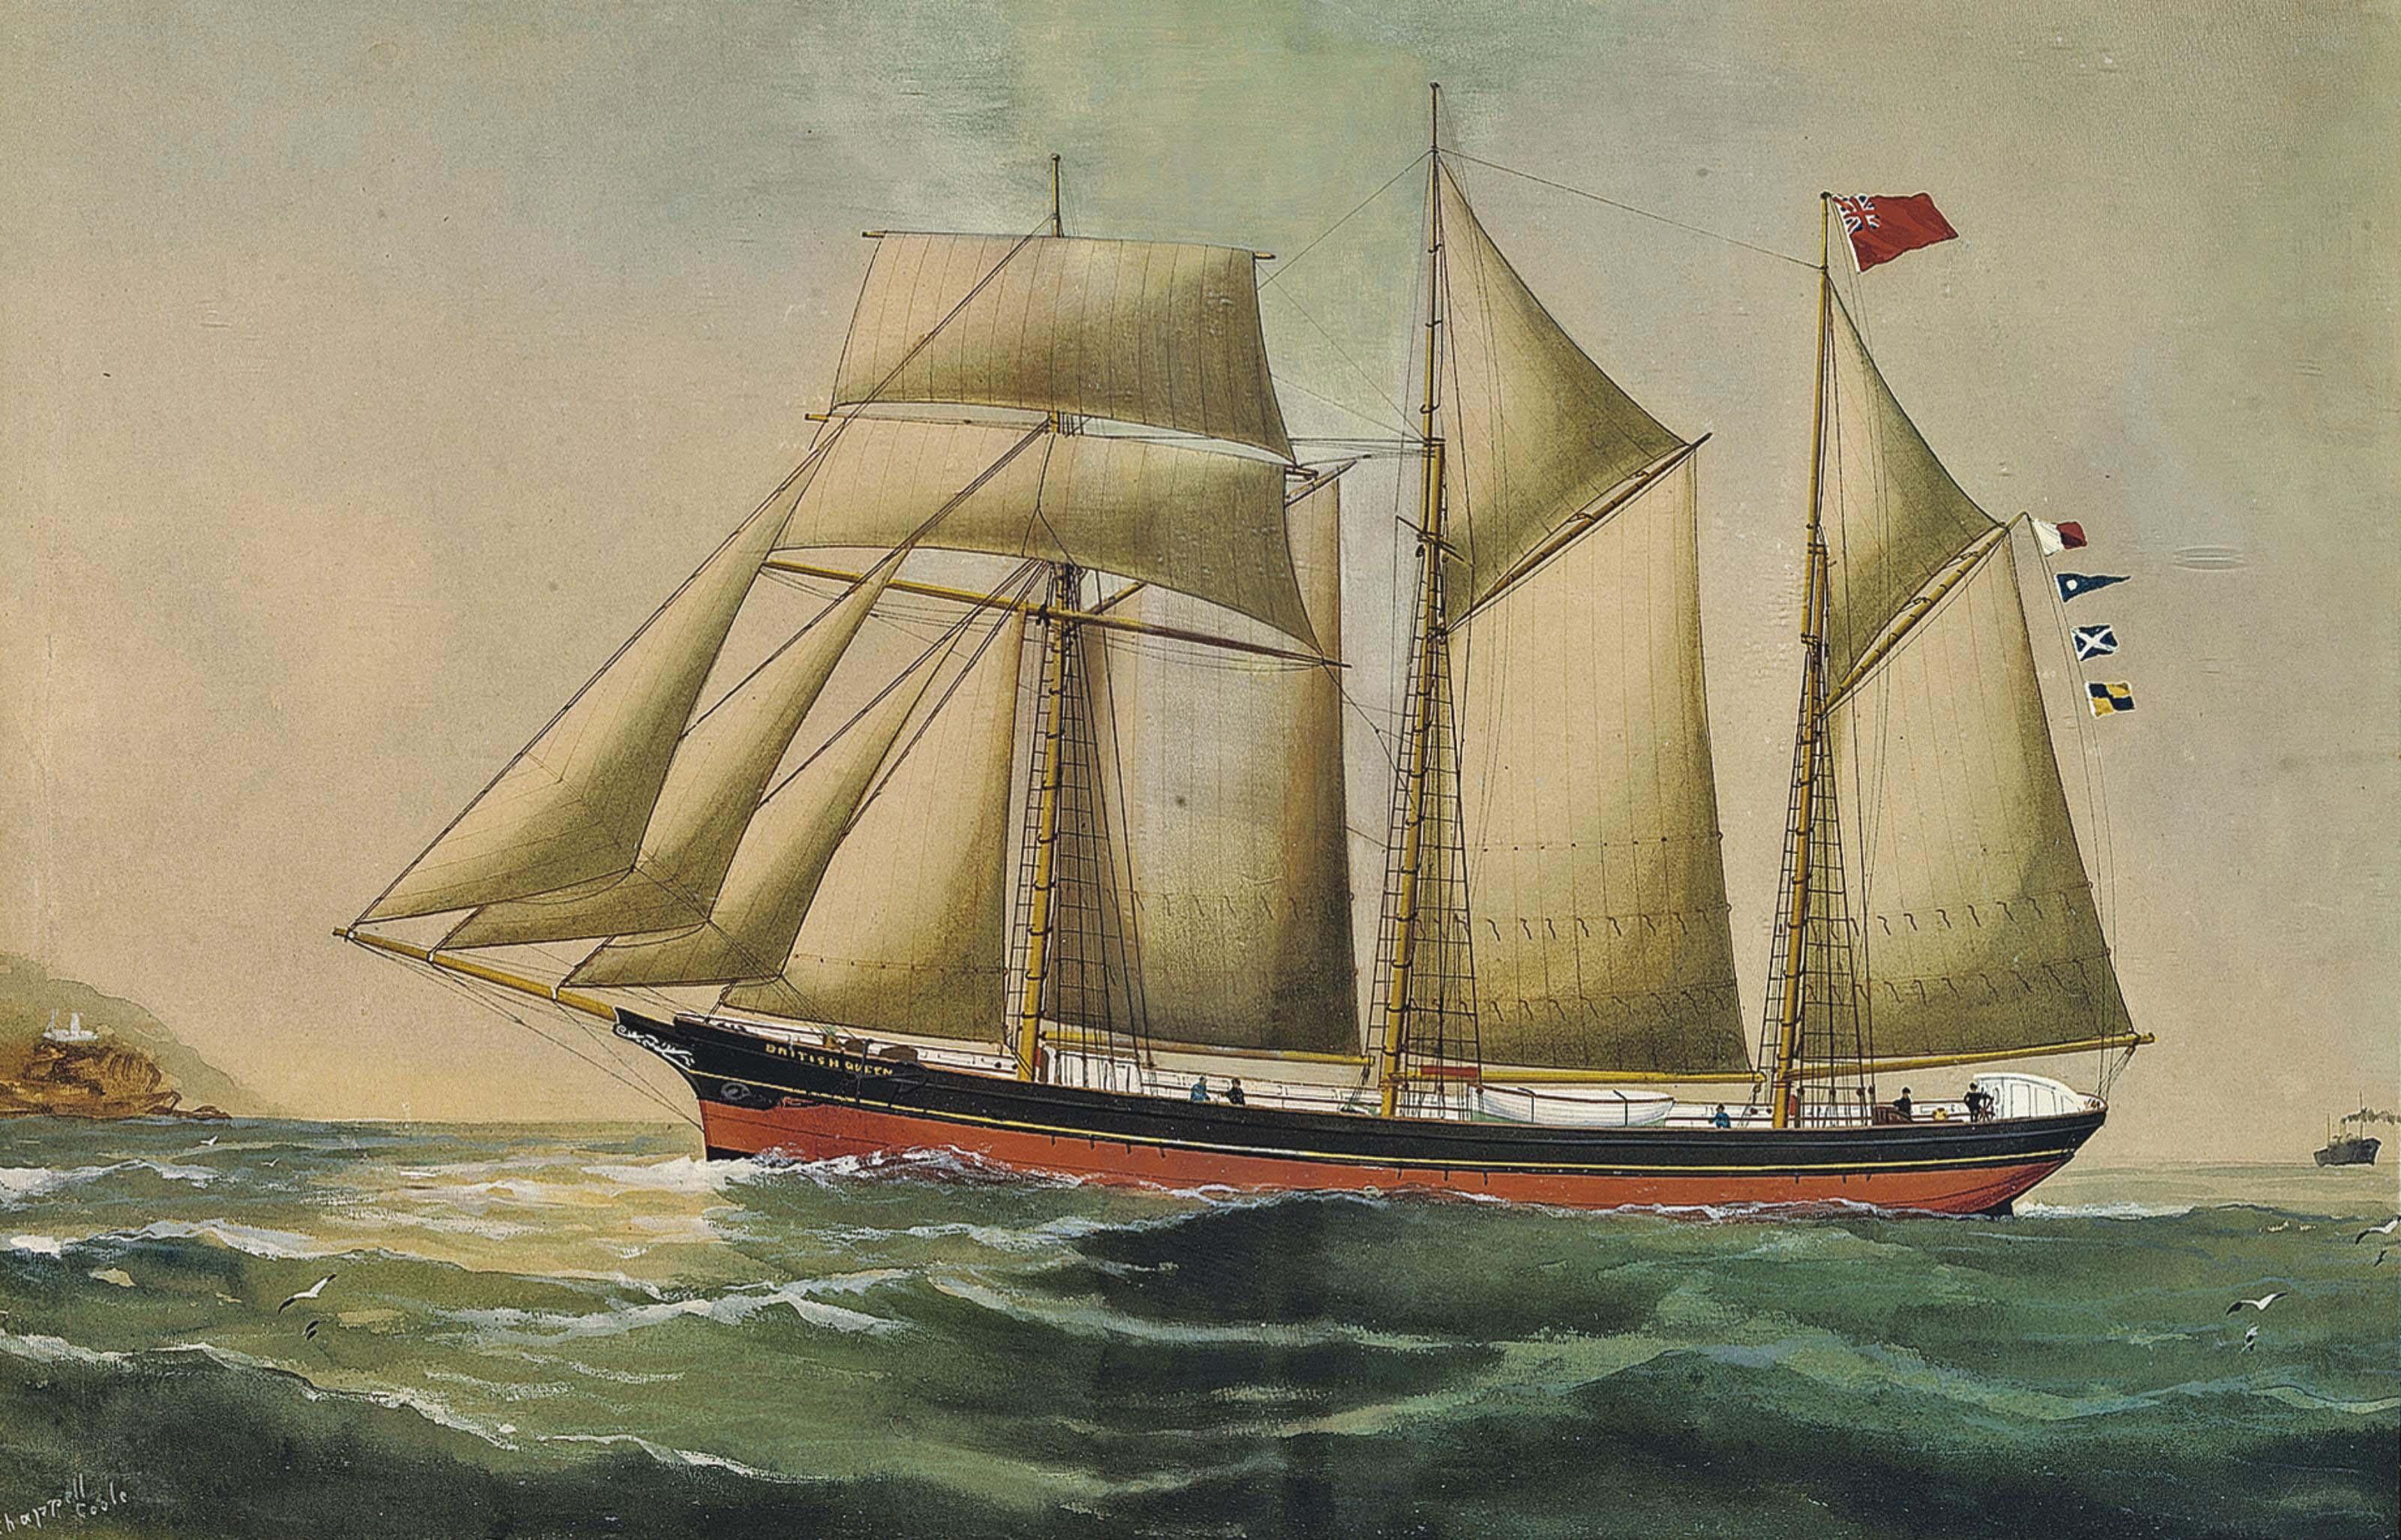 The British Queen of Barrow in coastal waters (illustrated); and The British Queen of Barrow reefed-down in heavy seas